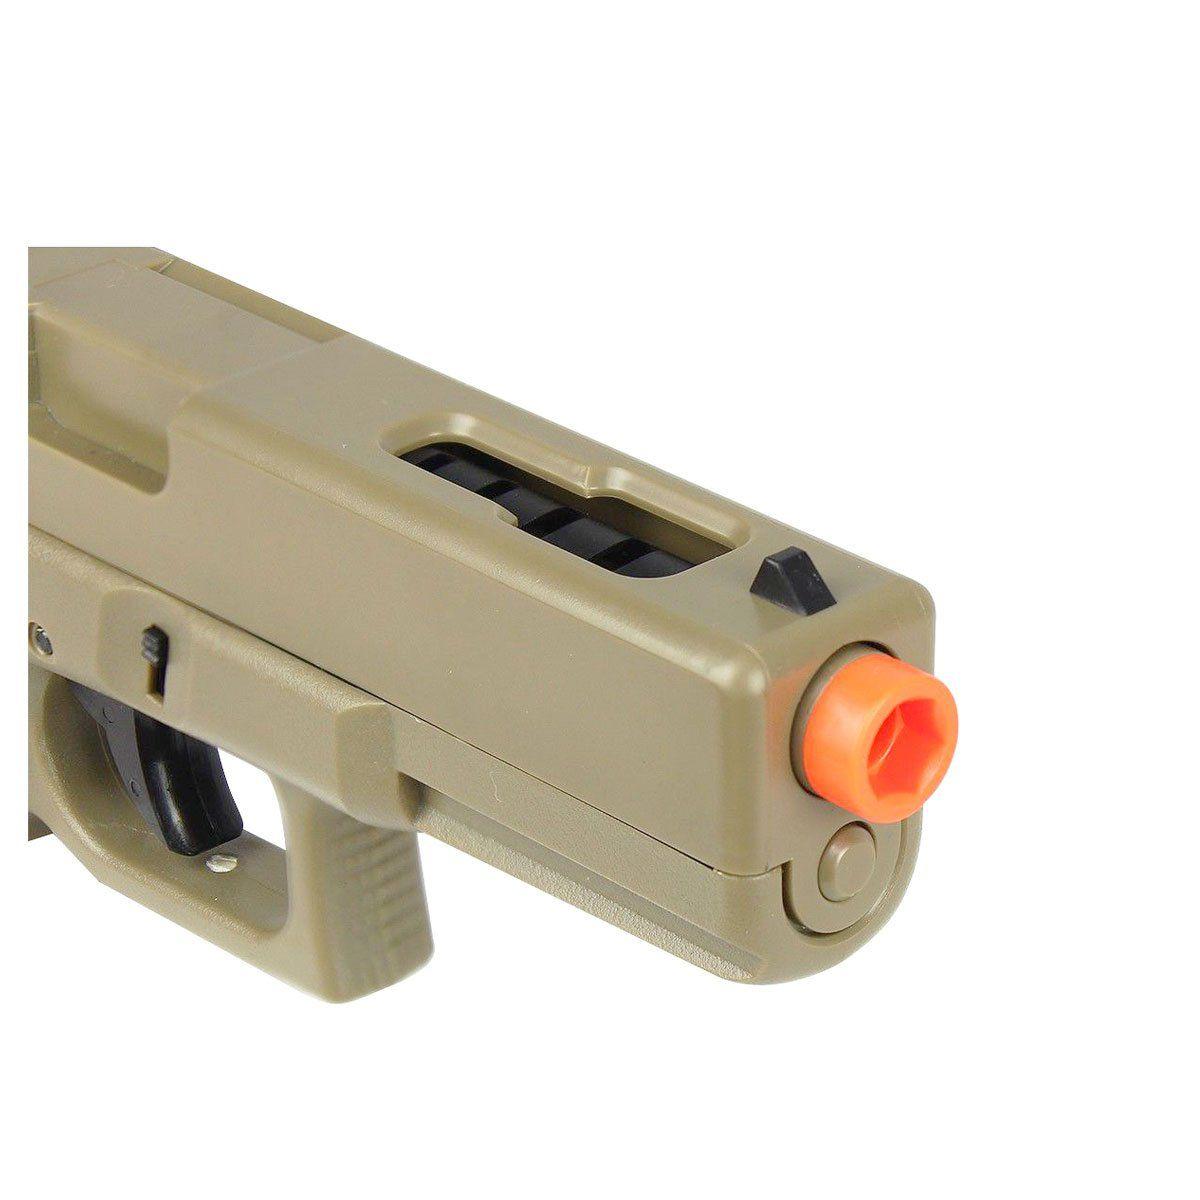 Pistola de Airsoft CYMA CM.030 Glock G18 Elétrica Bivolt